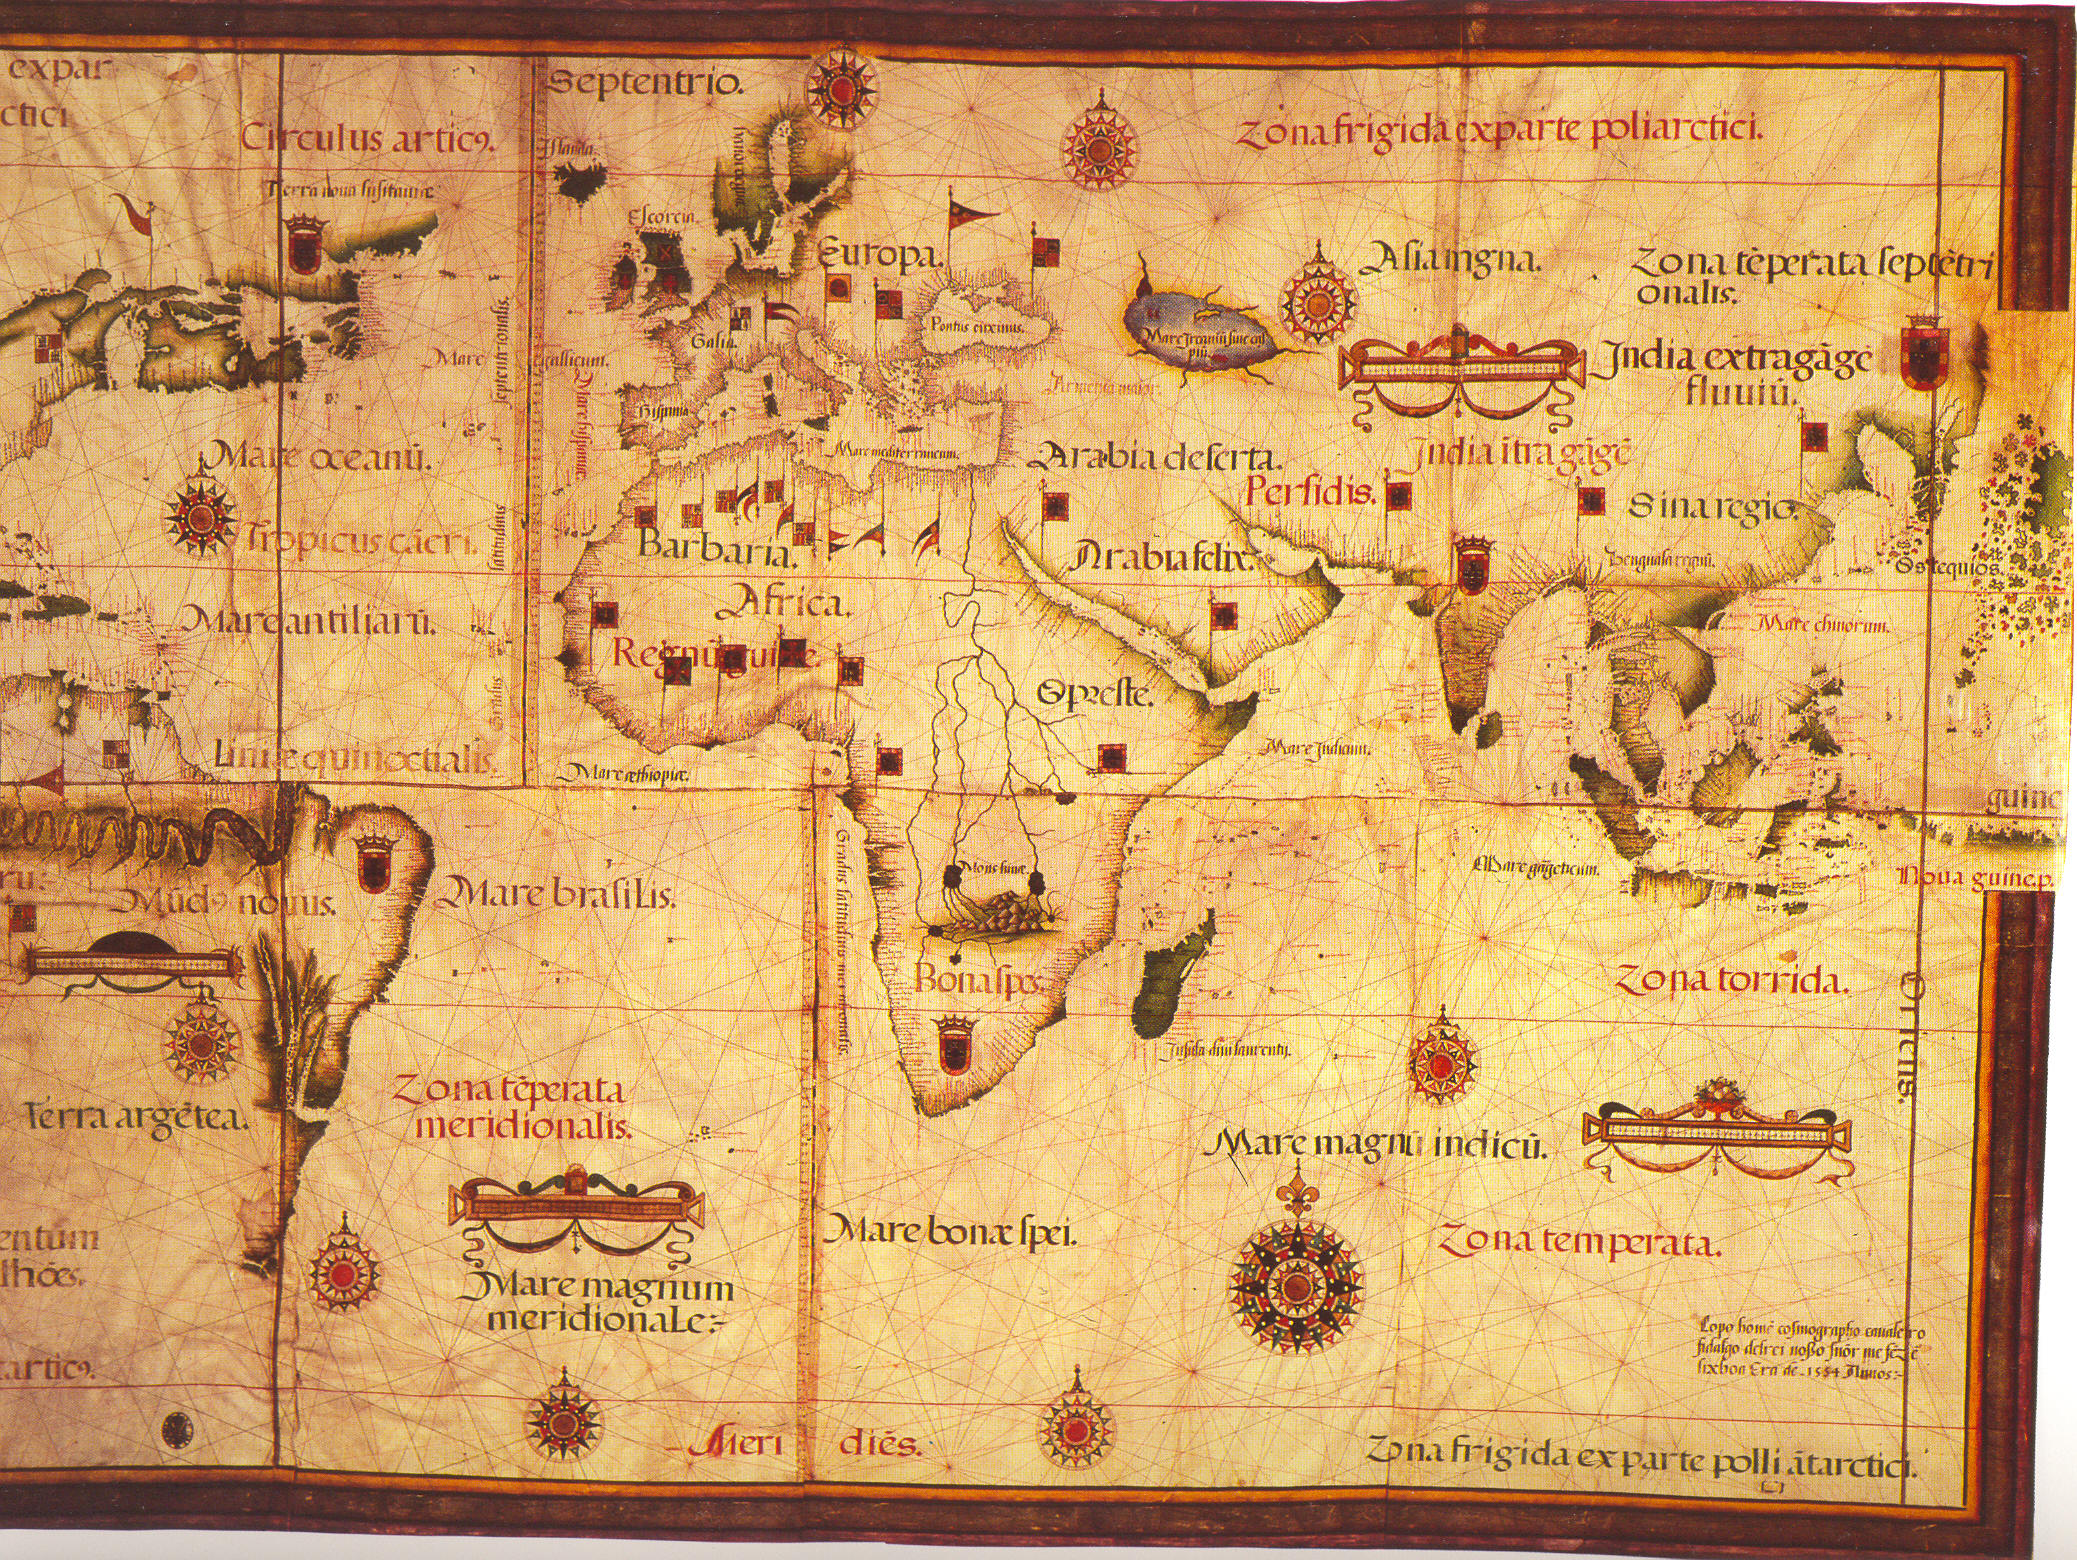 1554_lopo_homen_mapa_mundi_03.jpg